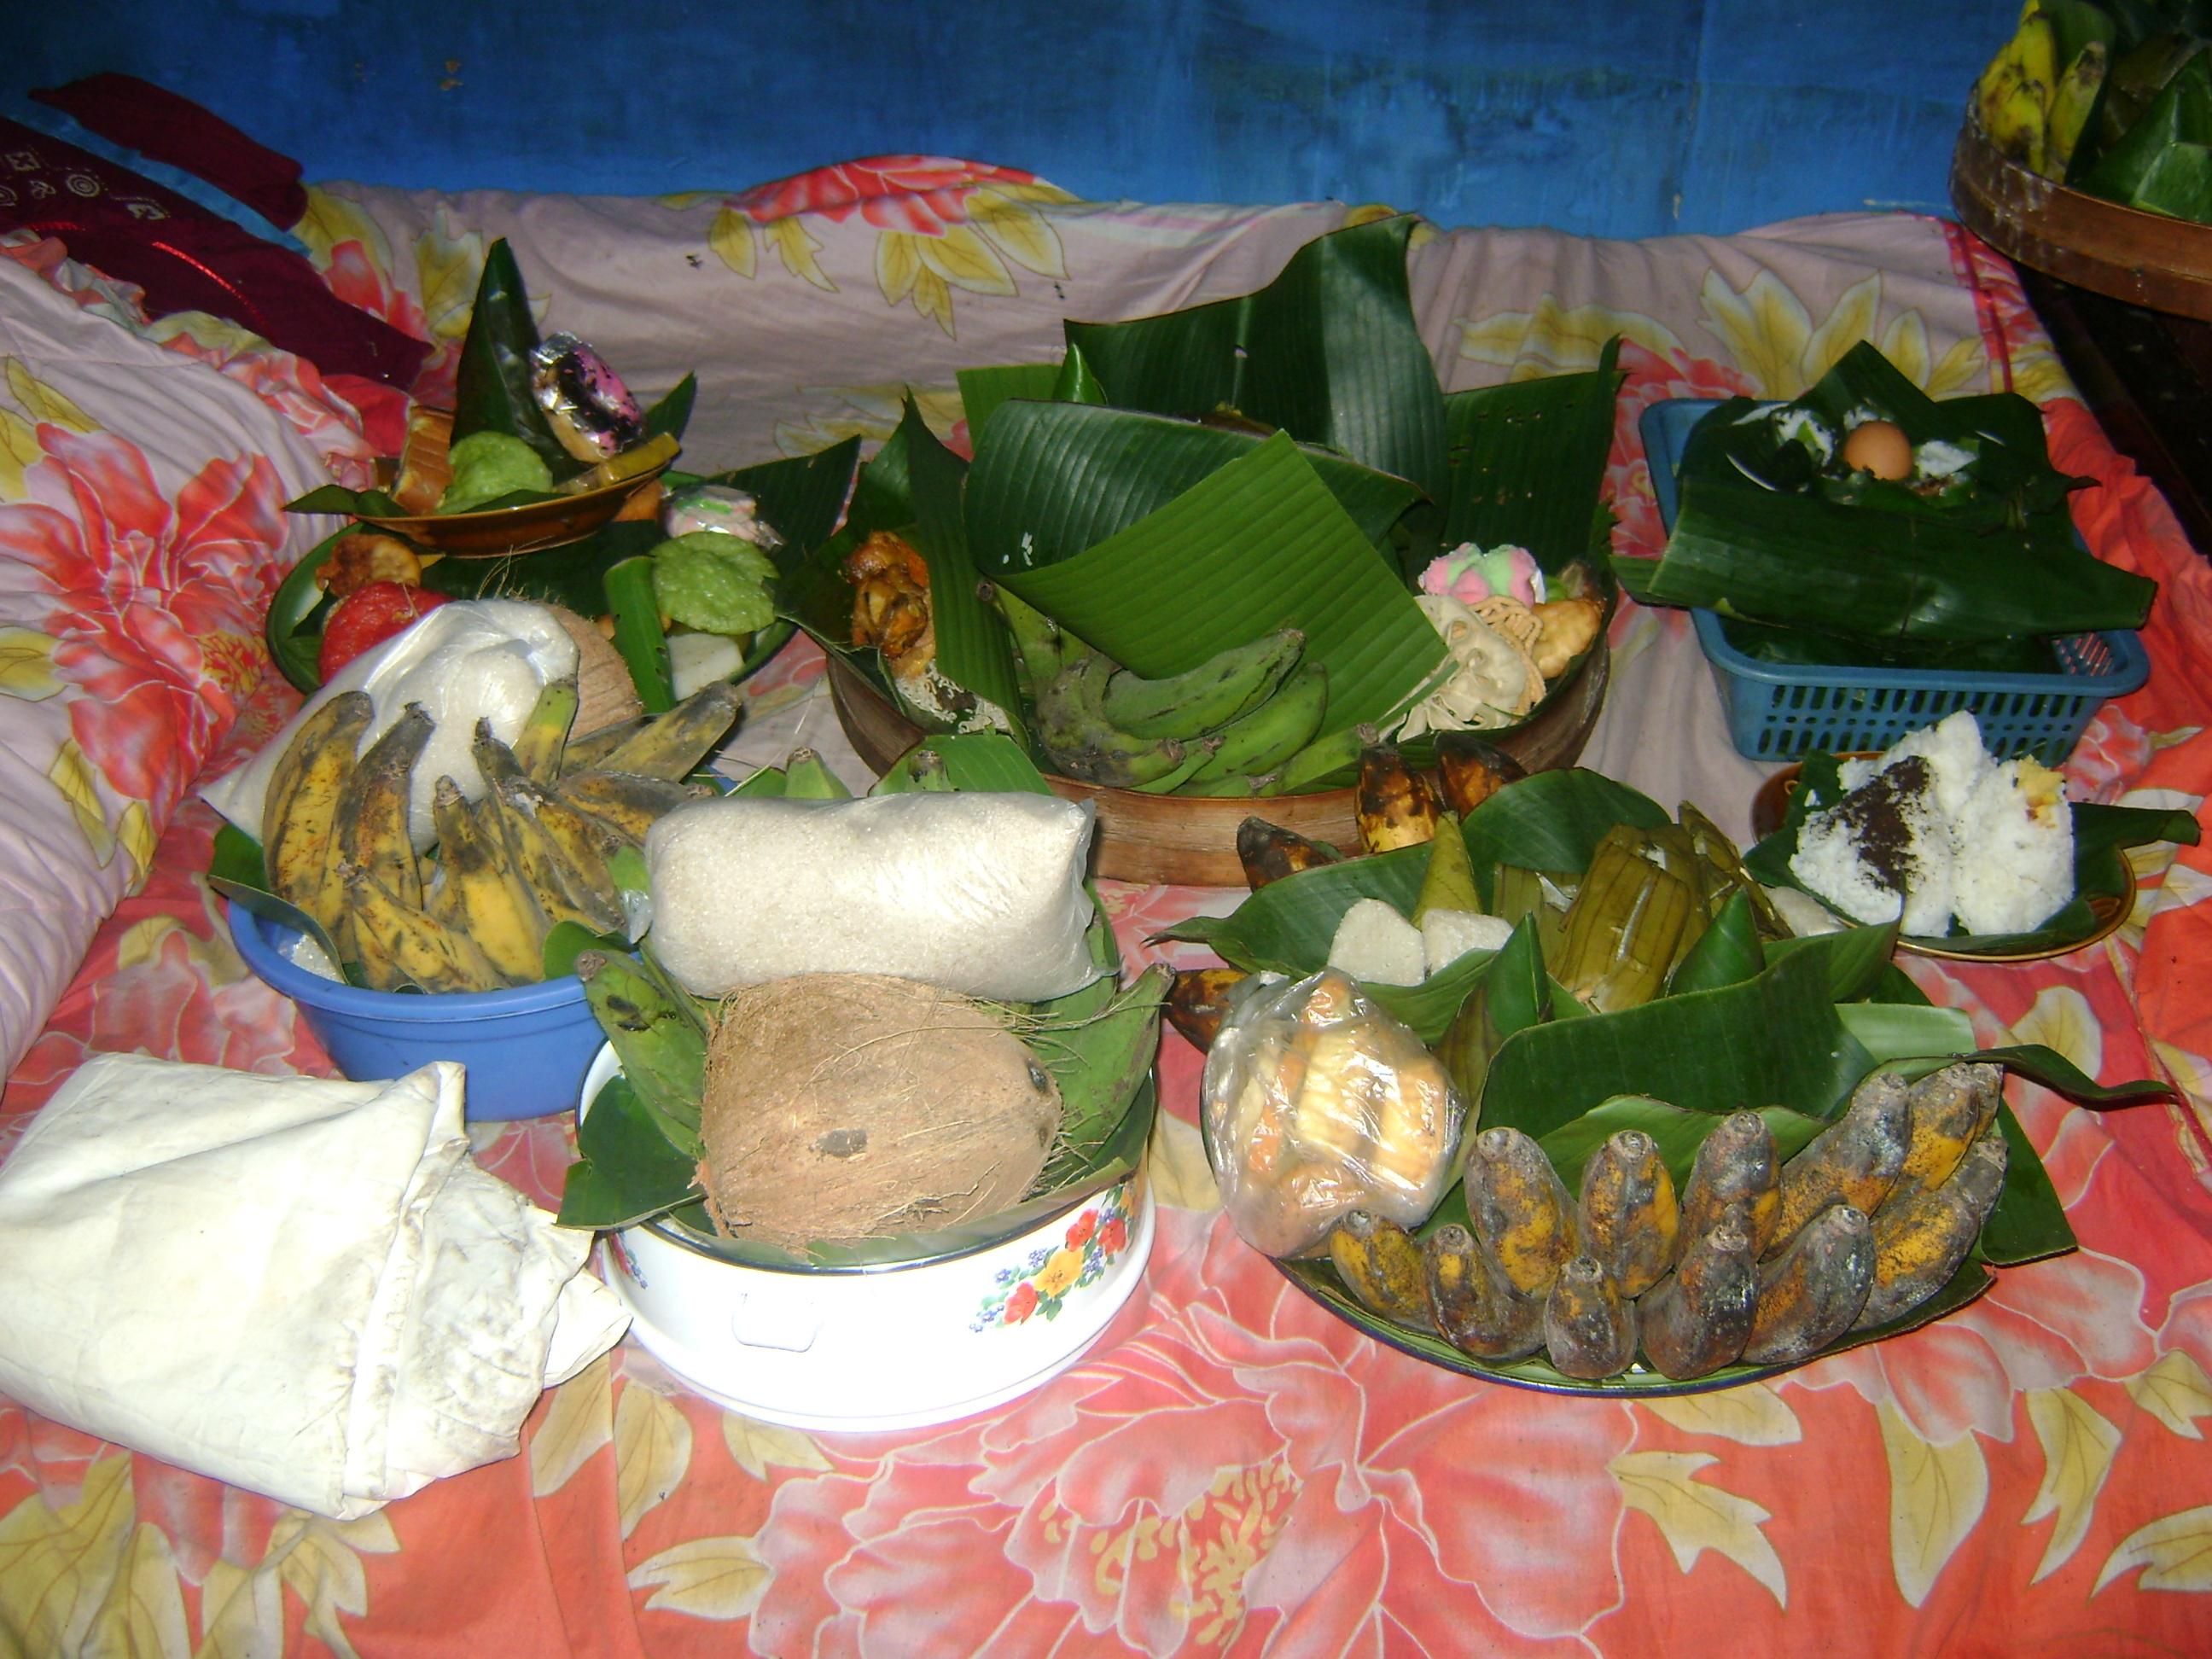 Upacara Karo Di Kabupaten Lumajang Pusaka Jawatimuran Kue Bakpia By Kuliner Yulis Saekowati Akumandiri Iklan